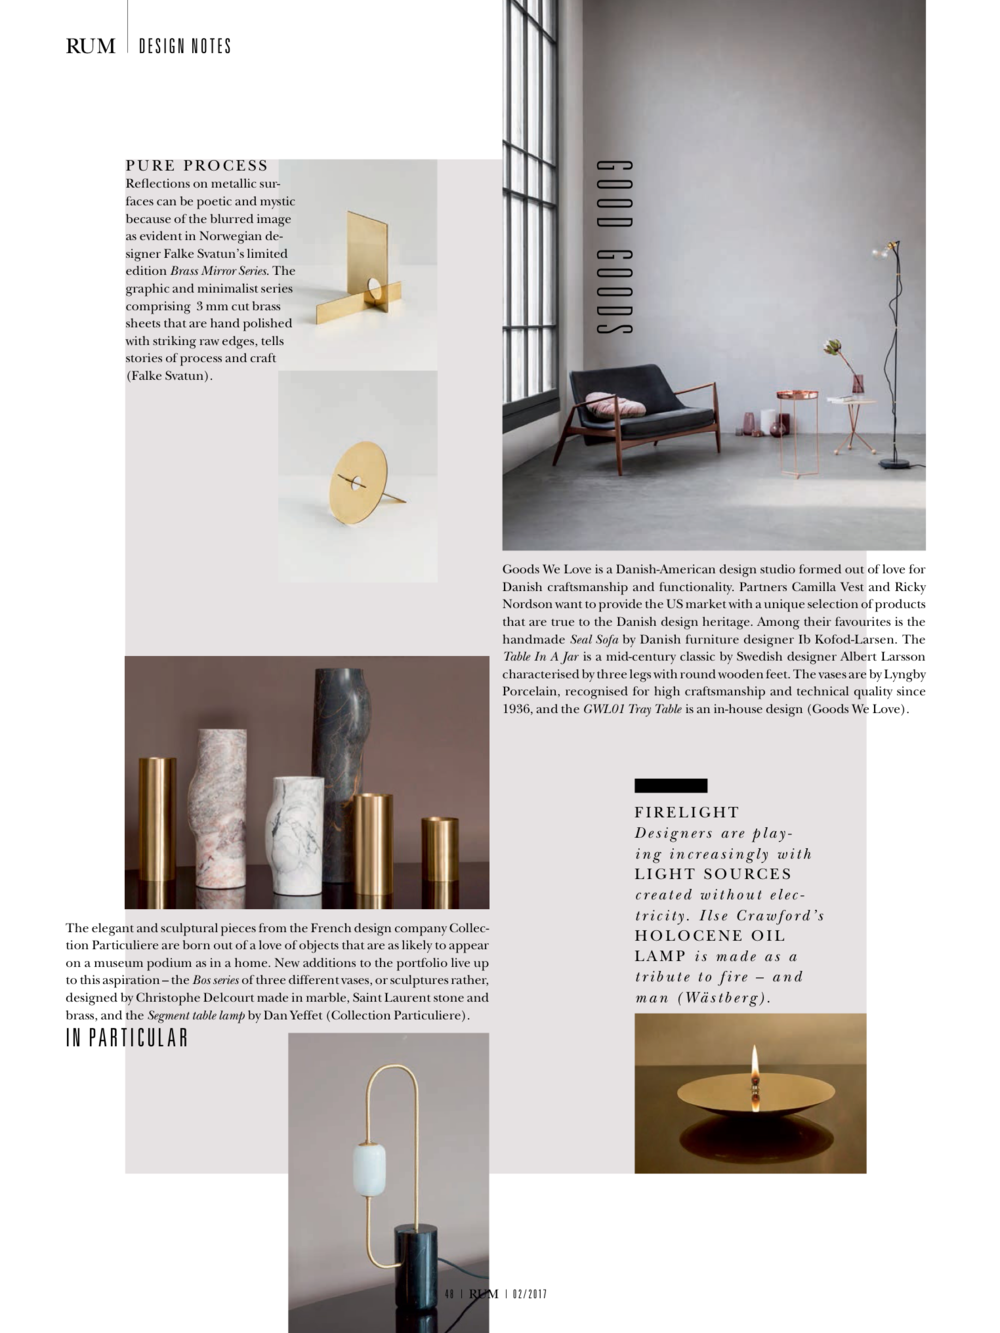 RUM International 2nd edition - Five Floor Lamp in Design Notes.